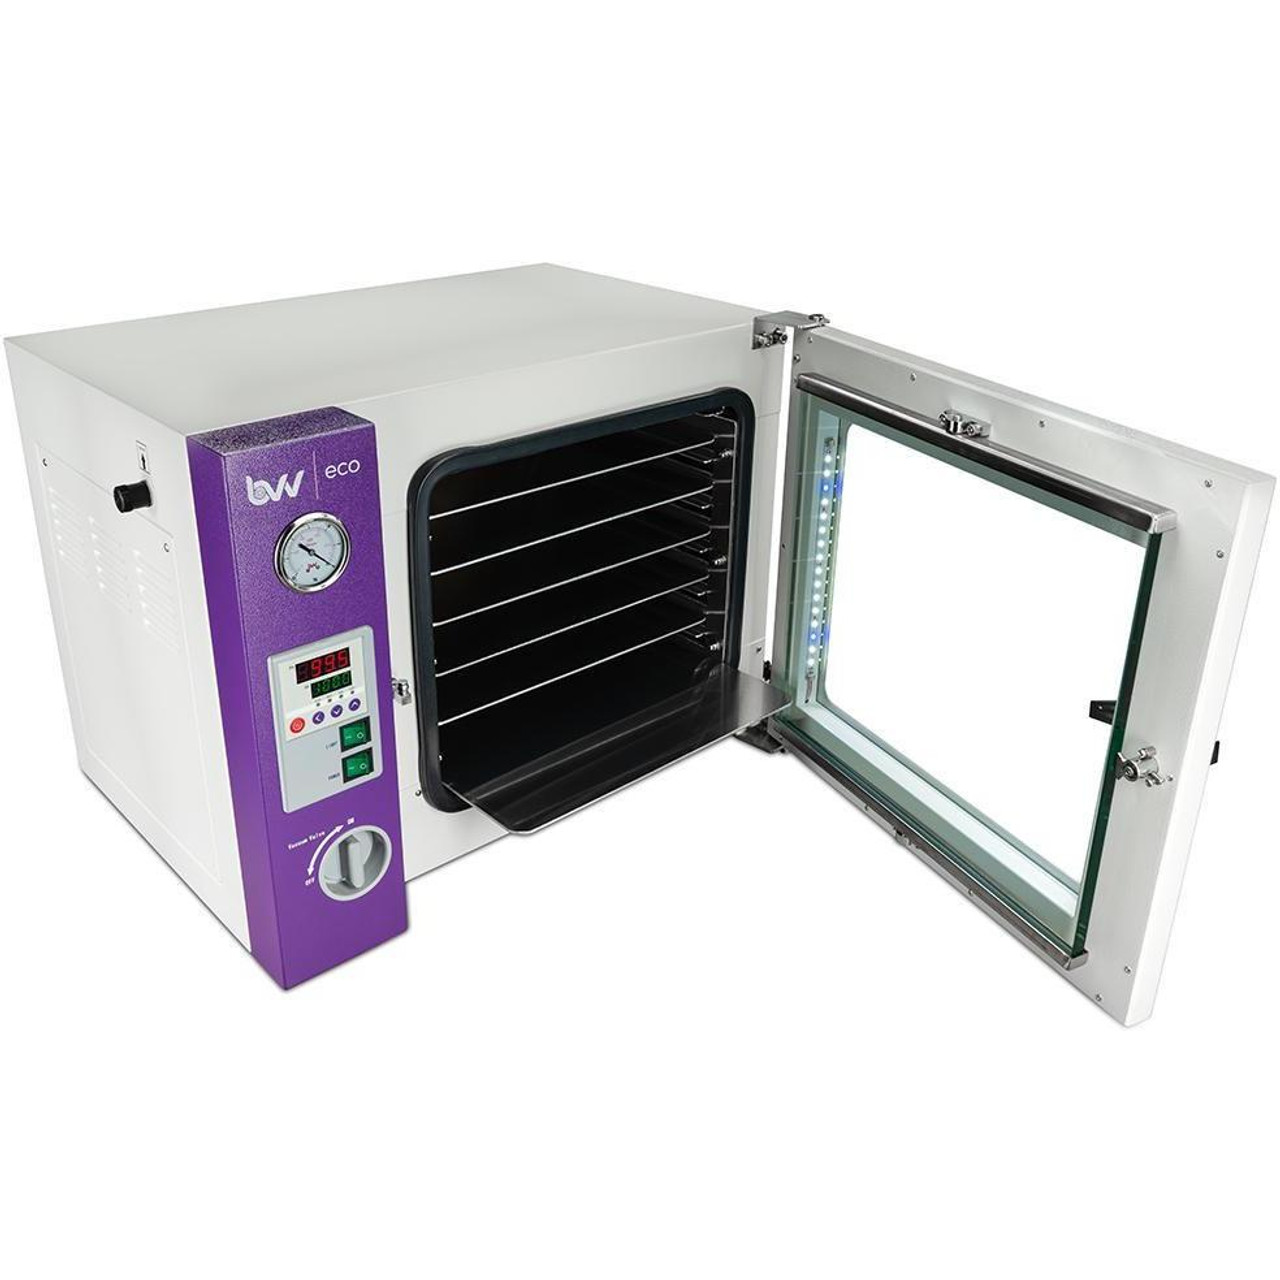 1.9CF ECO Vacuum Oven - 4 Wall Heating, LED display, LED's - 5 Shelves Standard